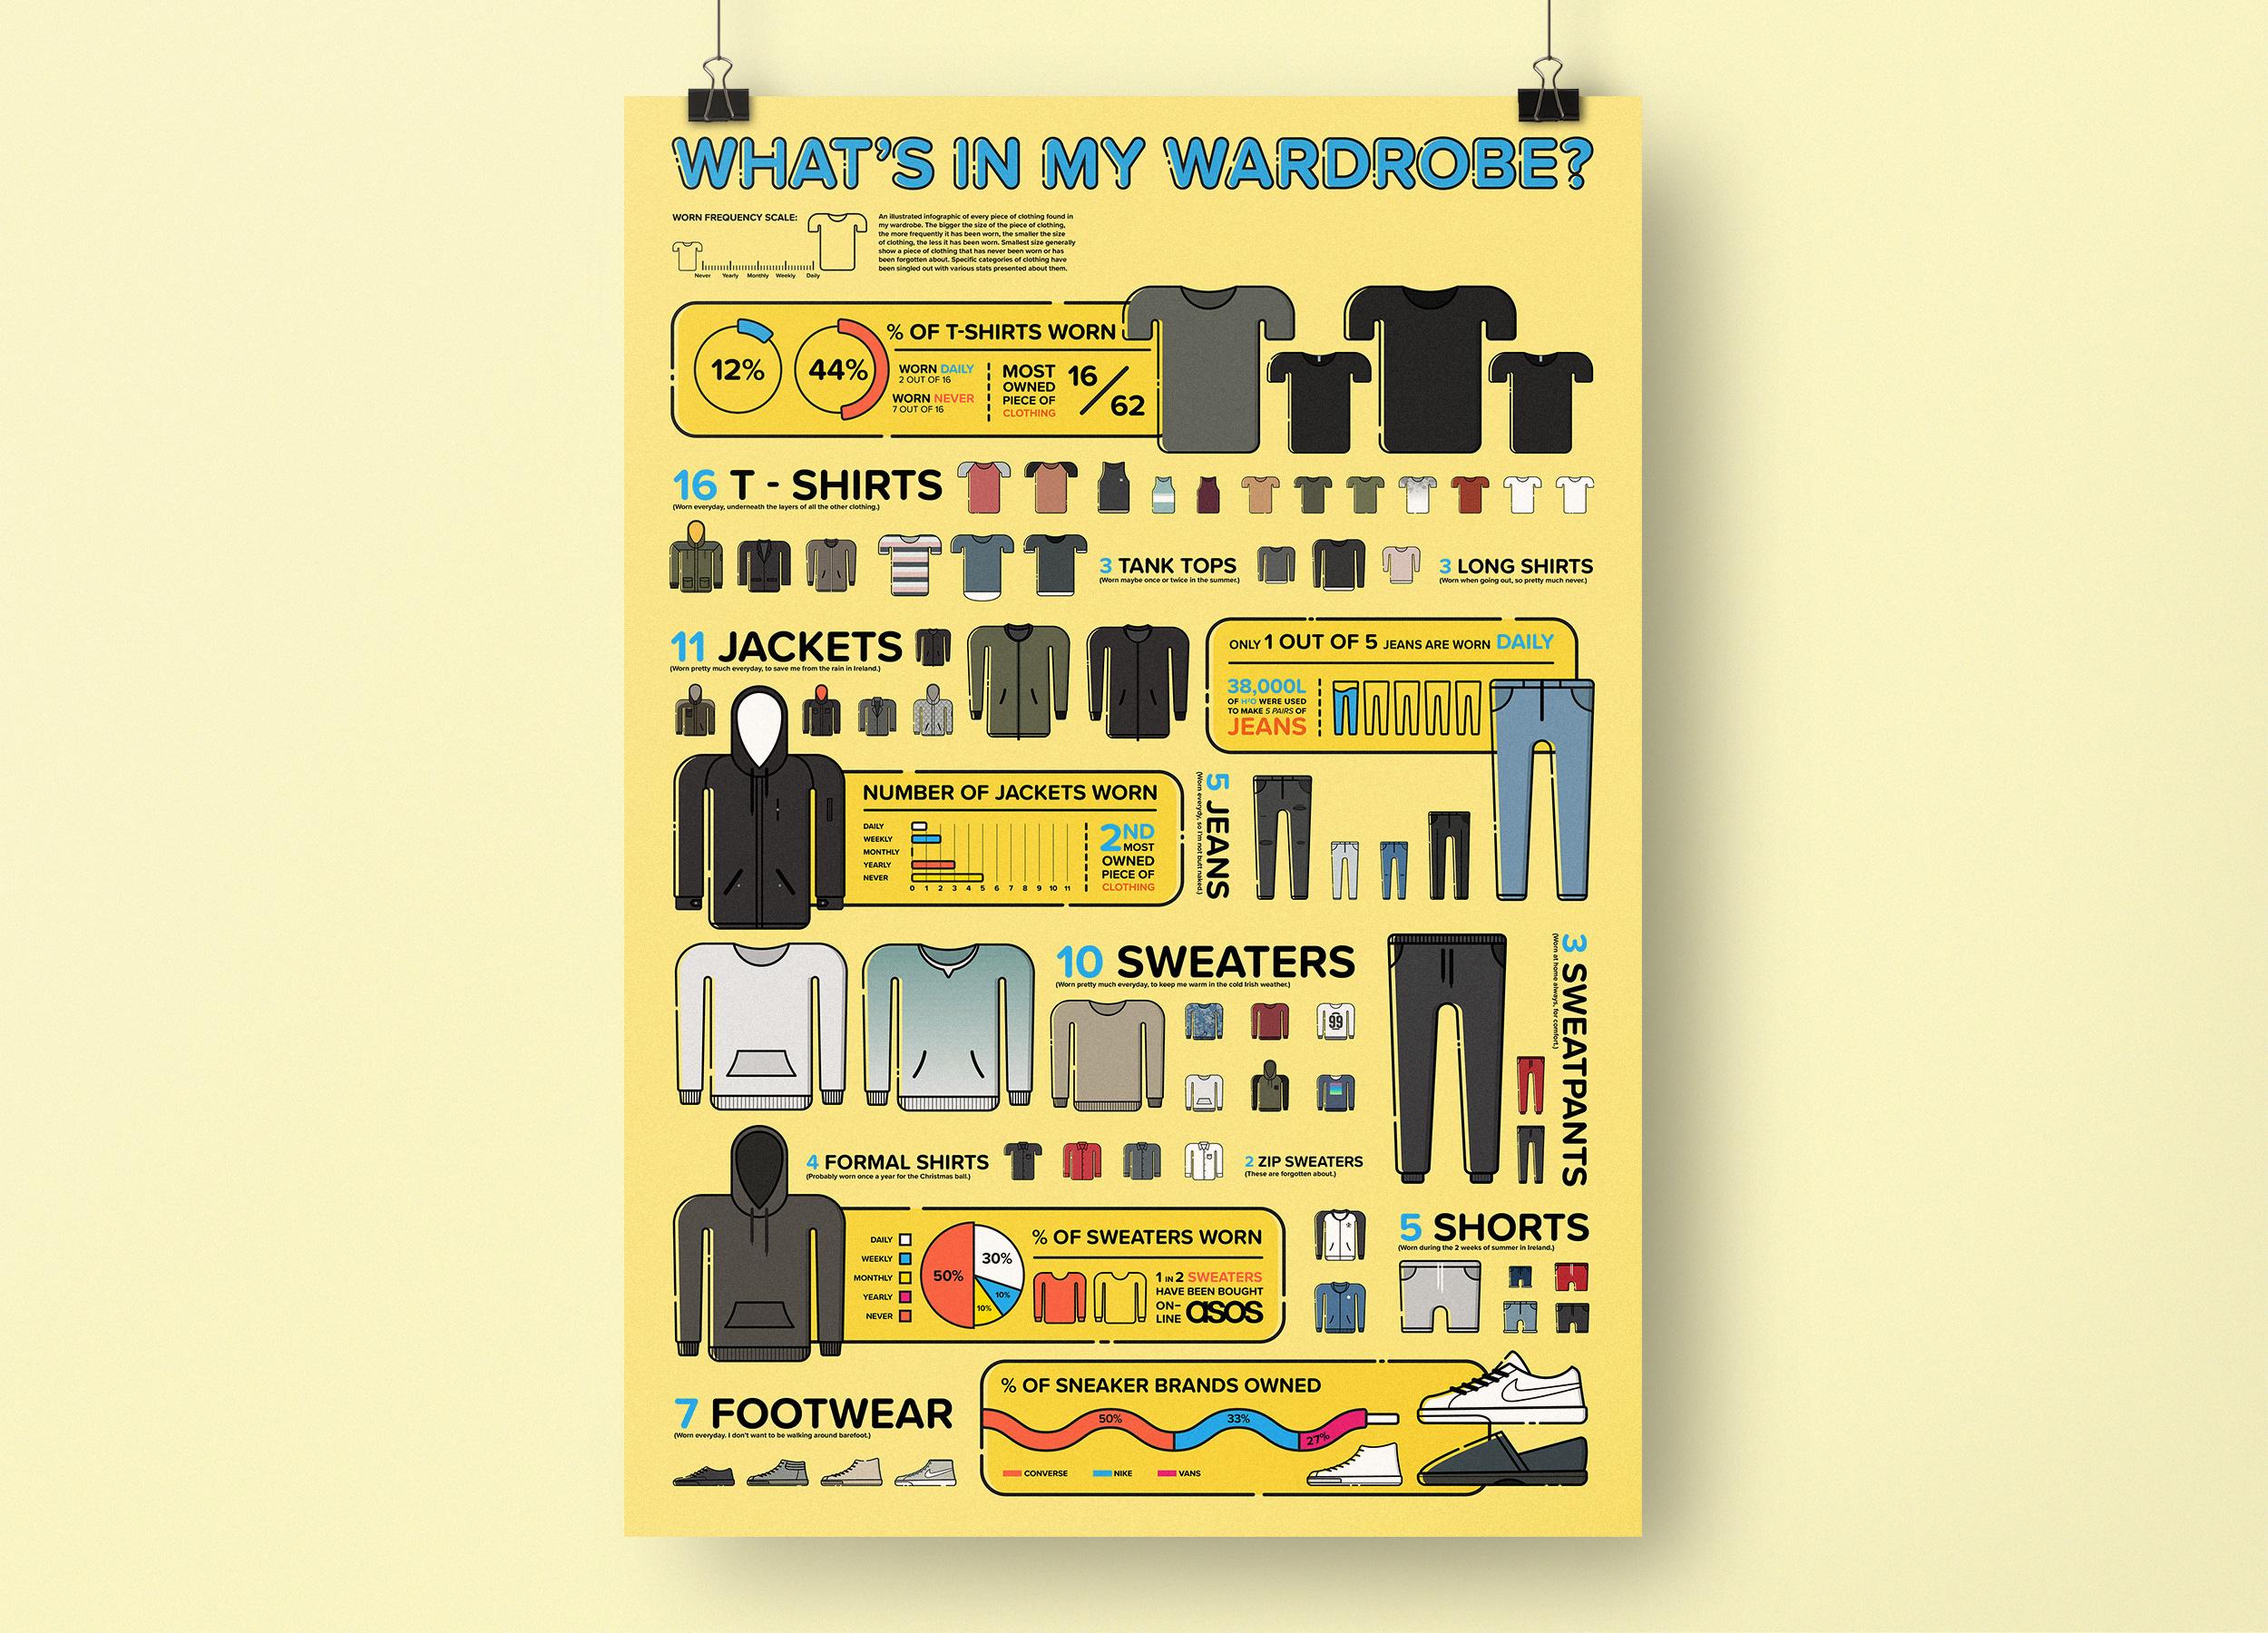 wardrobe5.jpg